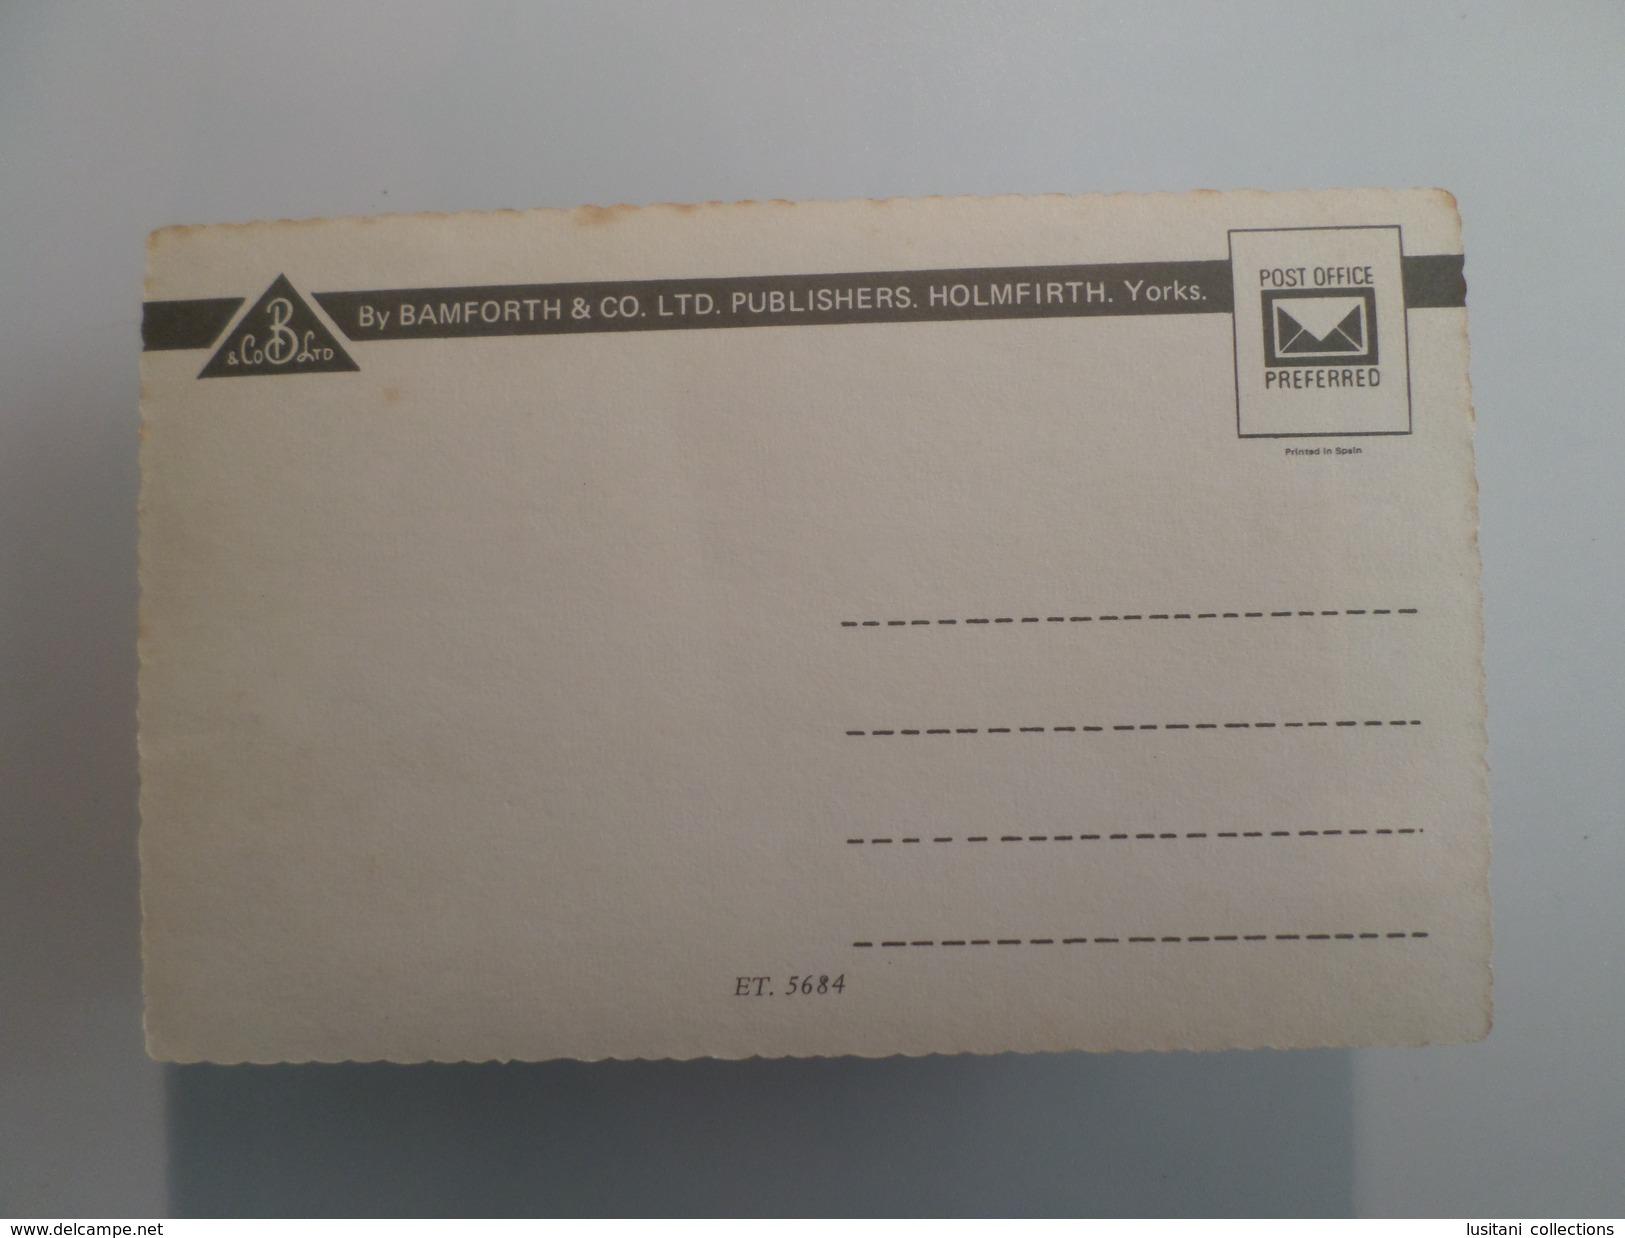 1960 YEARS UK ENGLAND WESTON-SUPER-MARE MULTI VIEWS POSTCARD - Weston-Super-Mare